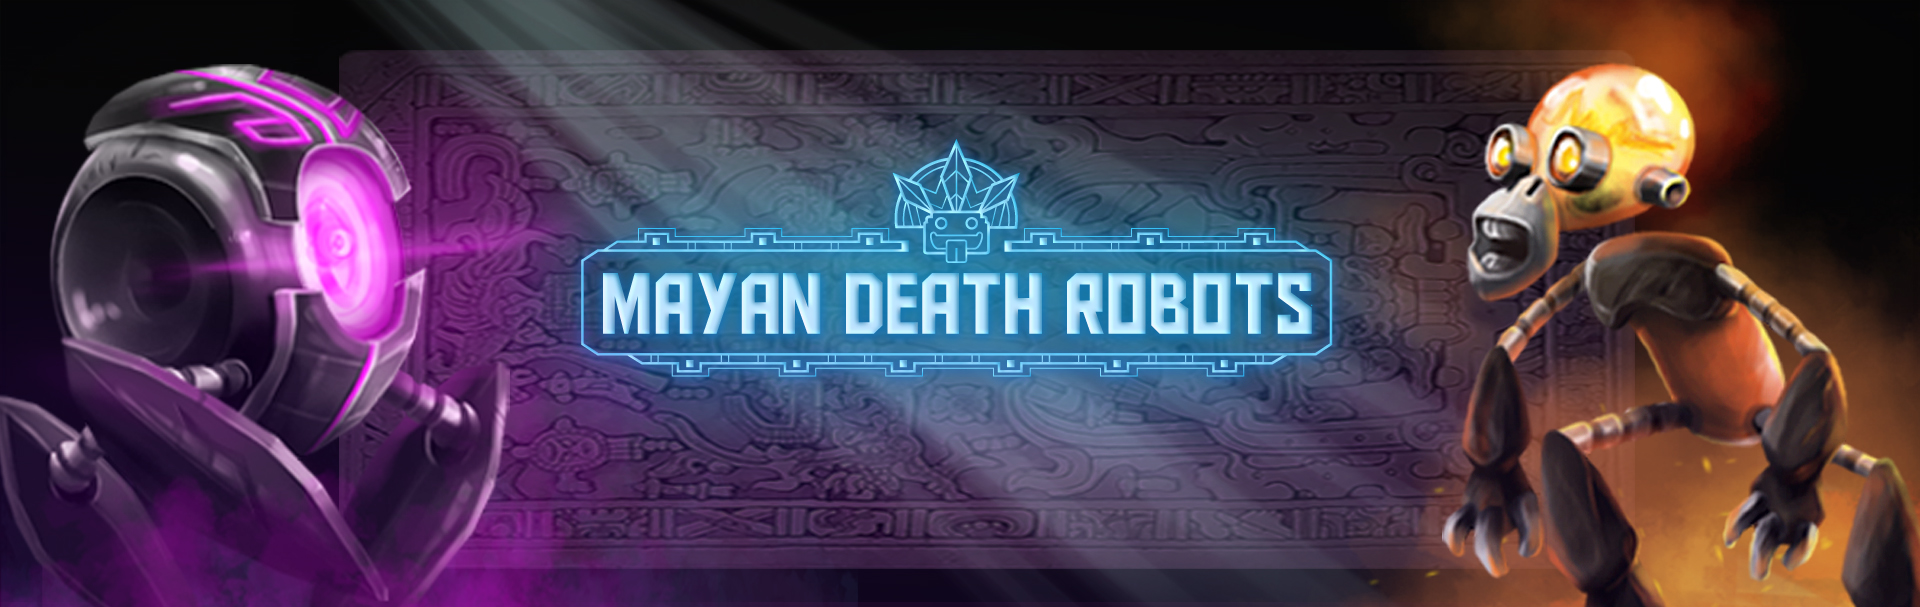 mayan_death_robots_artillery_combat_game_for_linux_mac_windows_pc